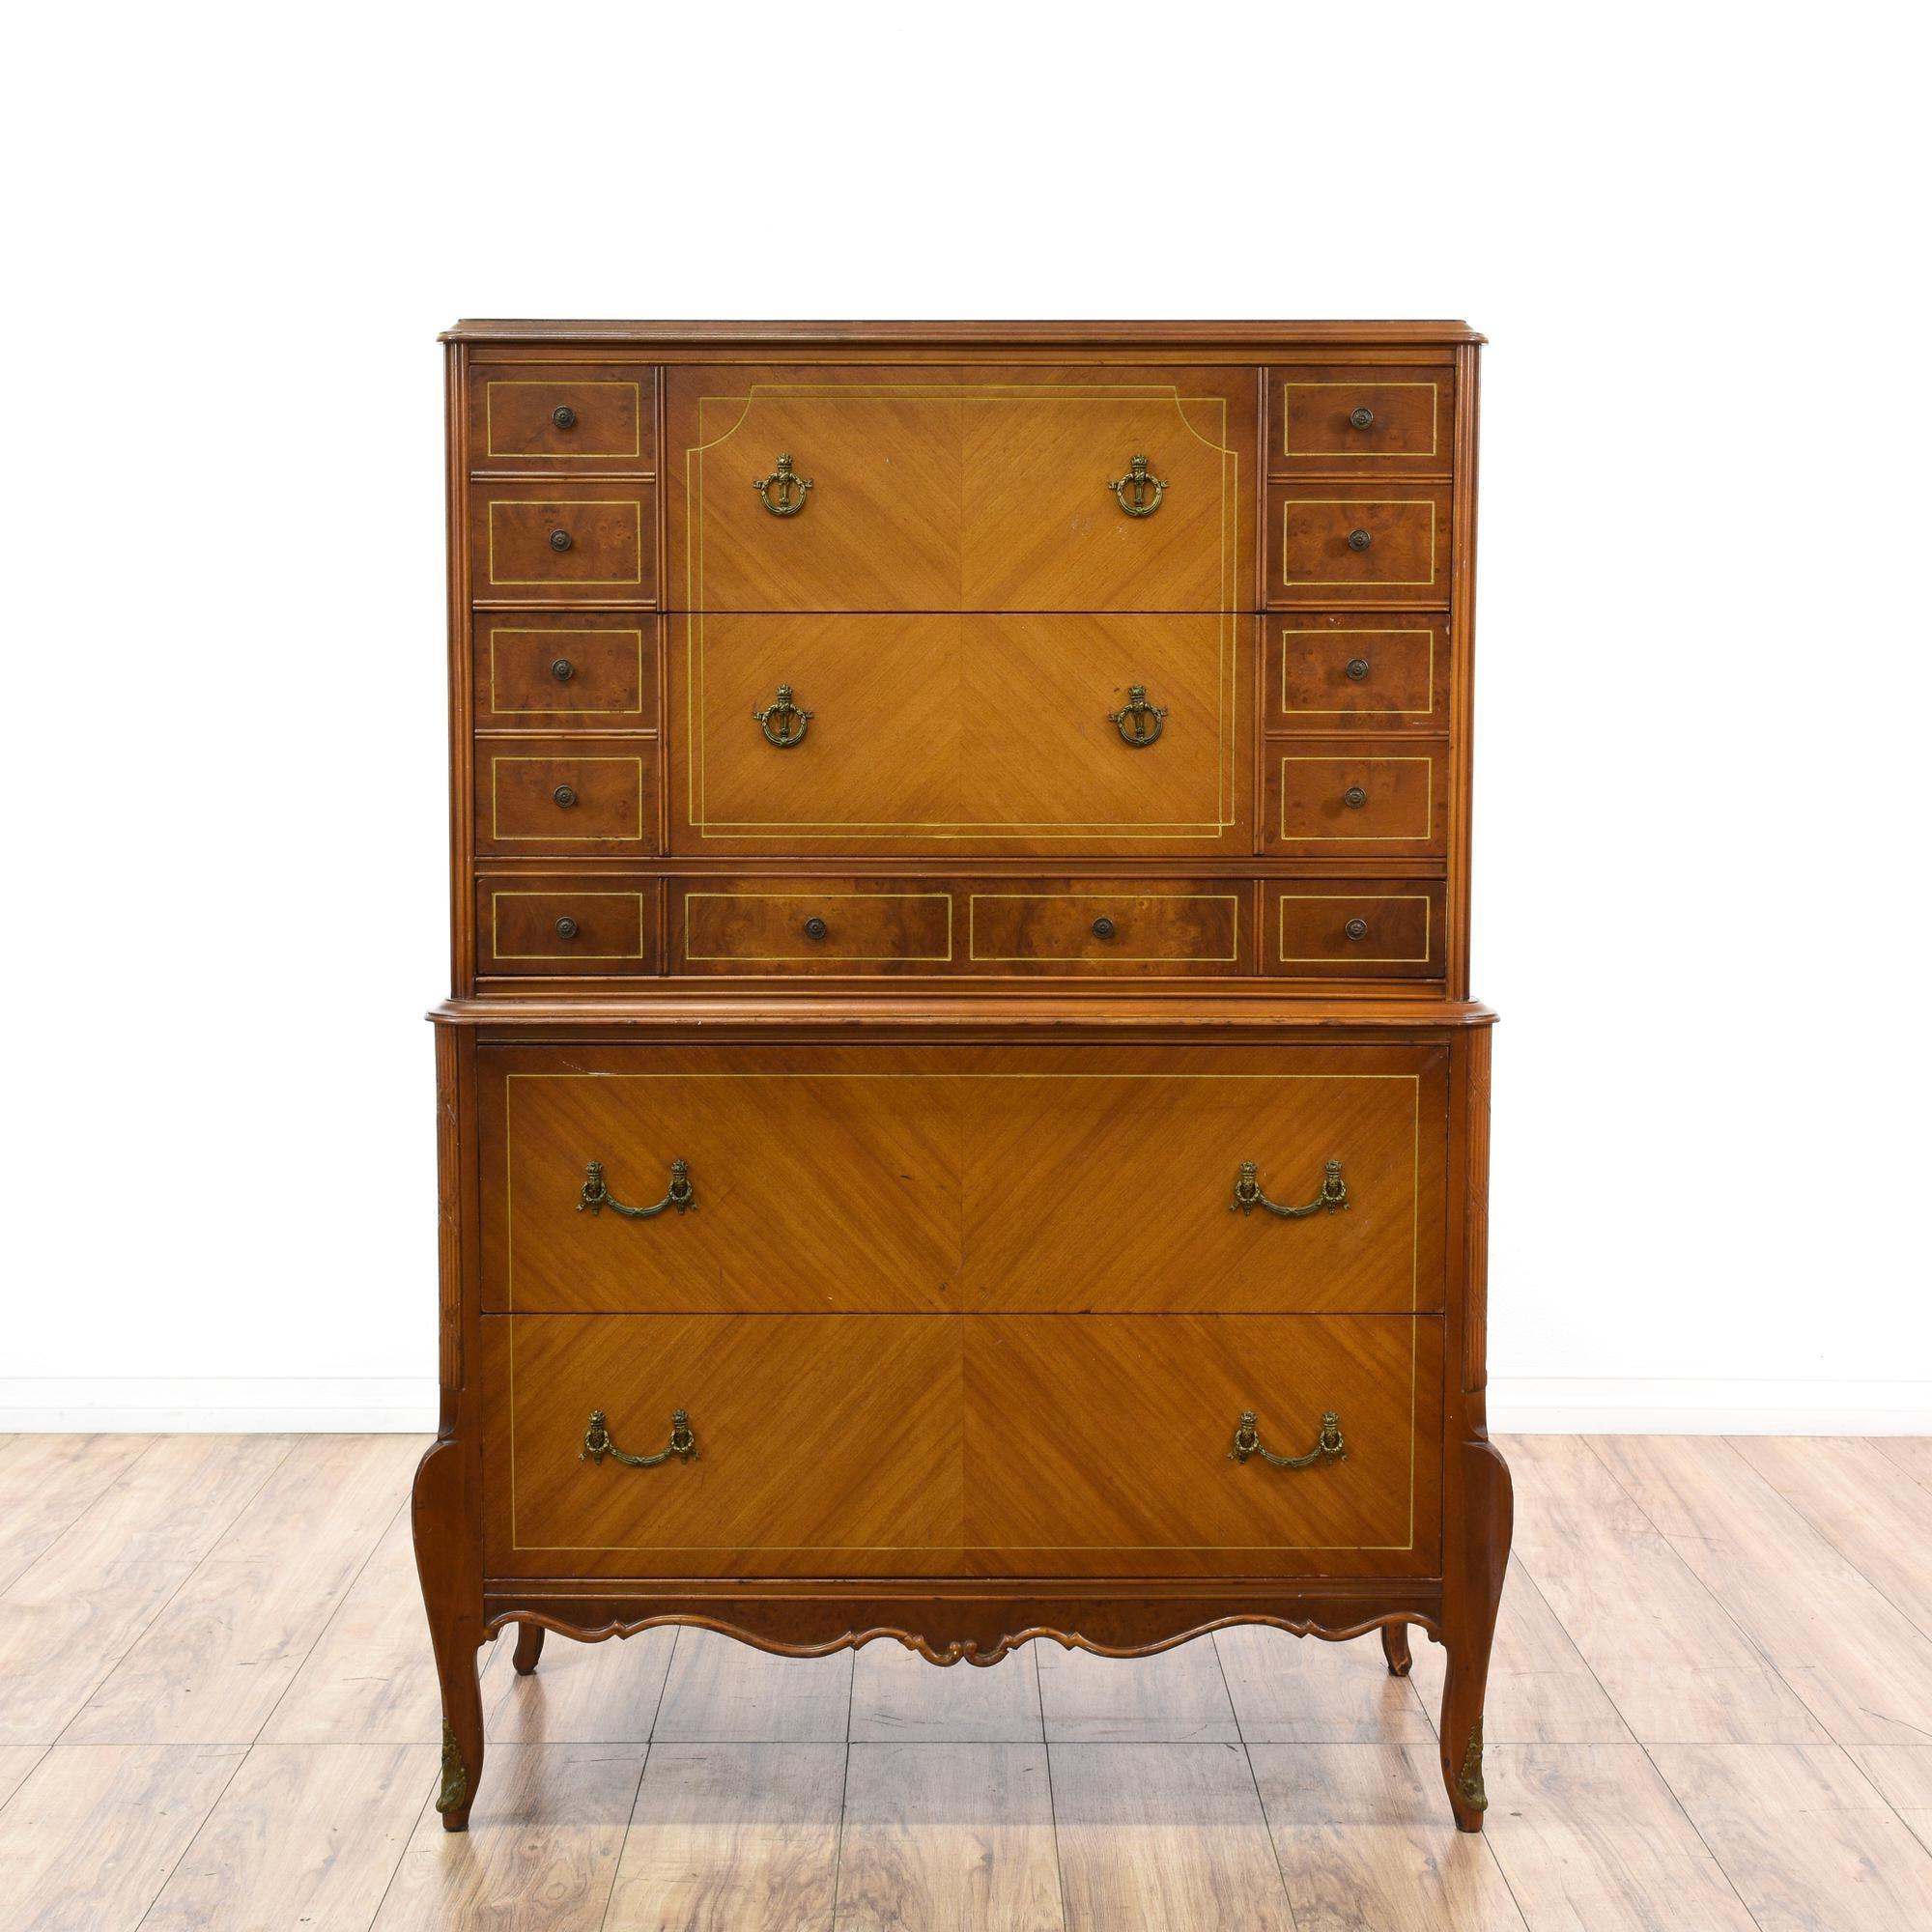 Carved Cherry Burl Wood Highboy Dresser